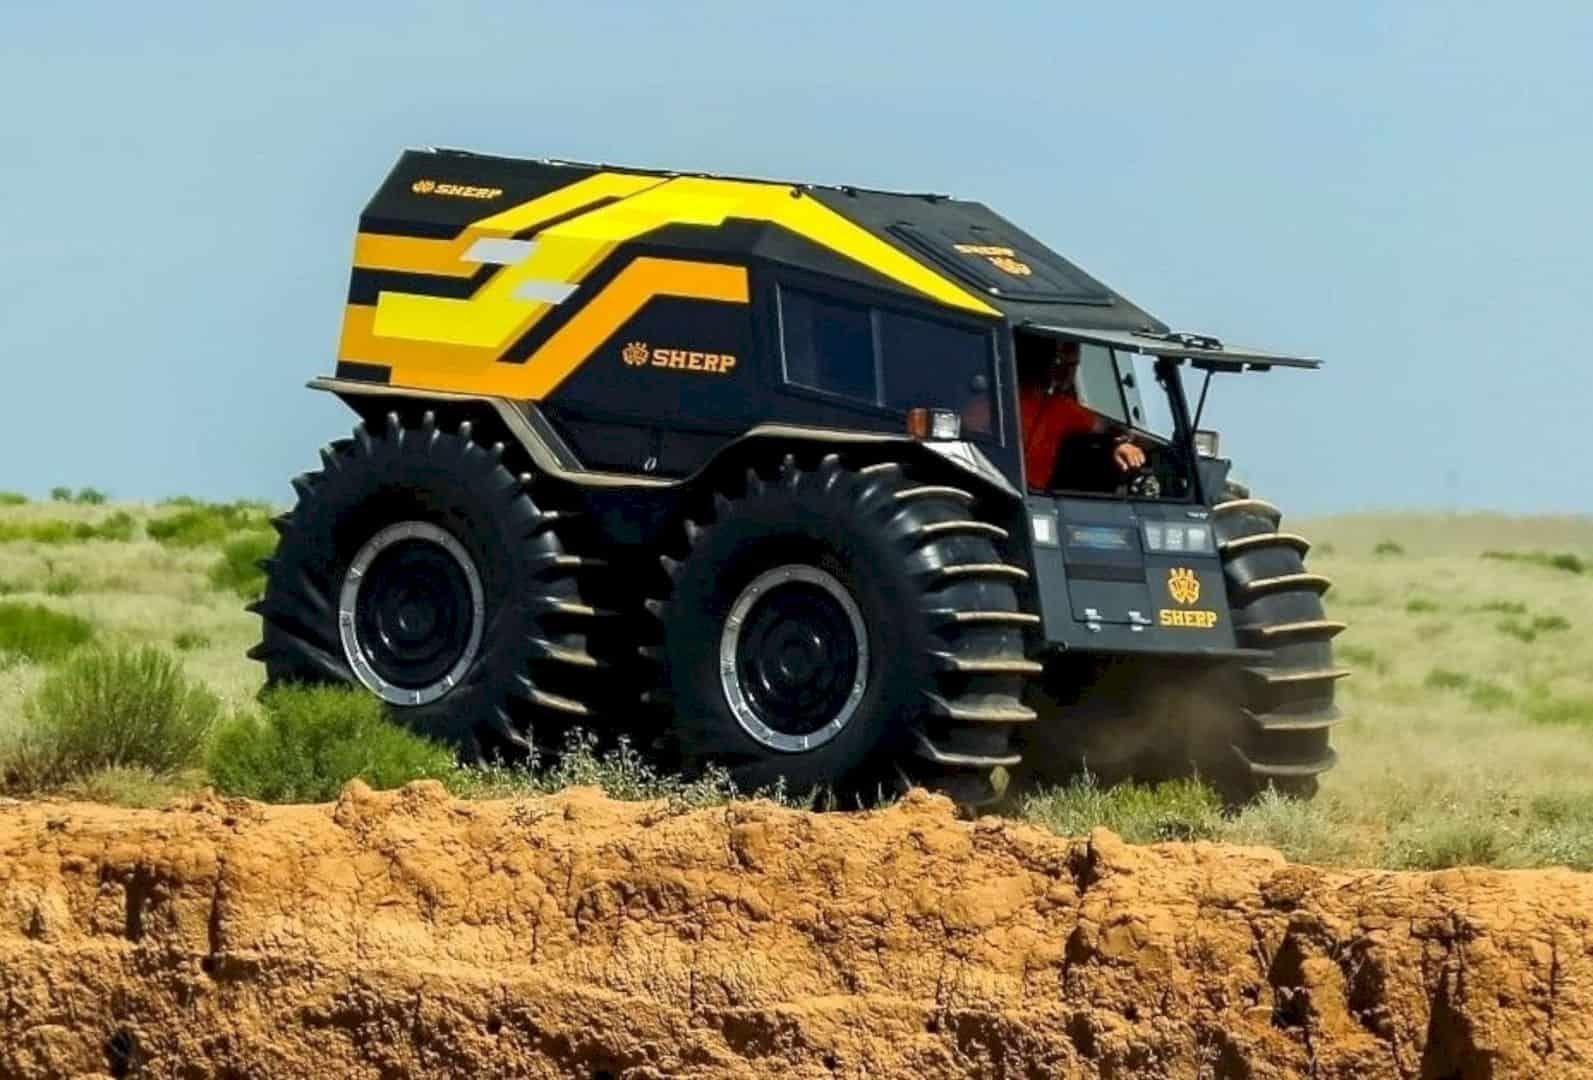 Sherp Ultimate Atv All Terrain Vehicles Terrain Vehicle Atv